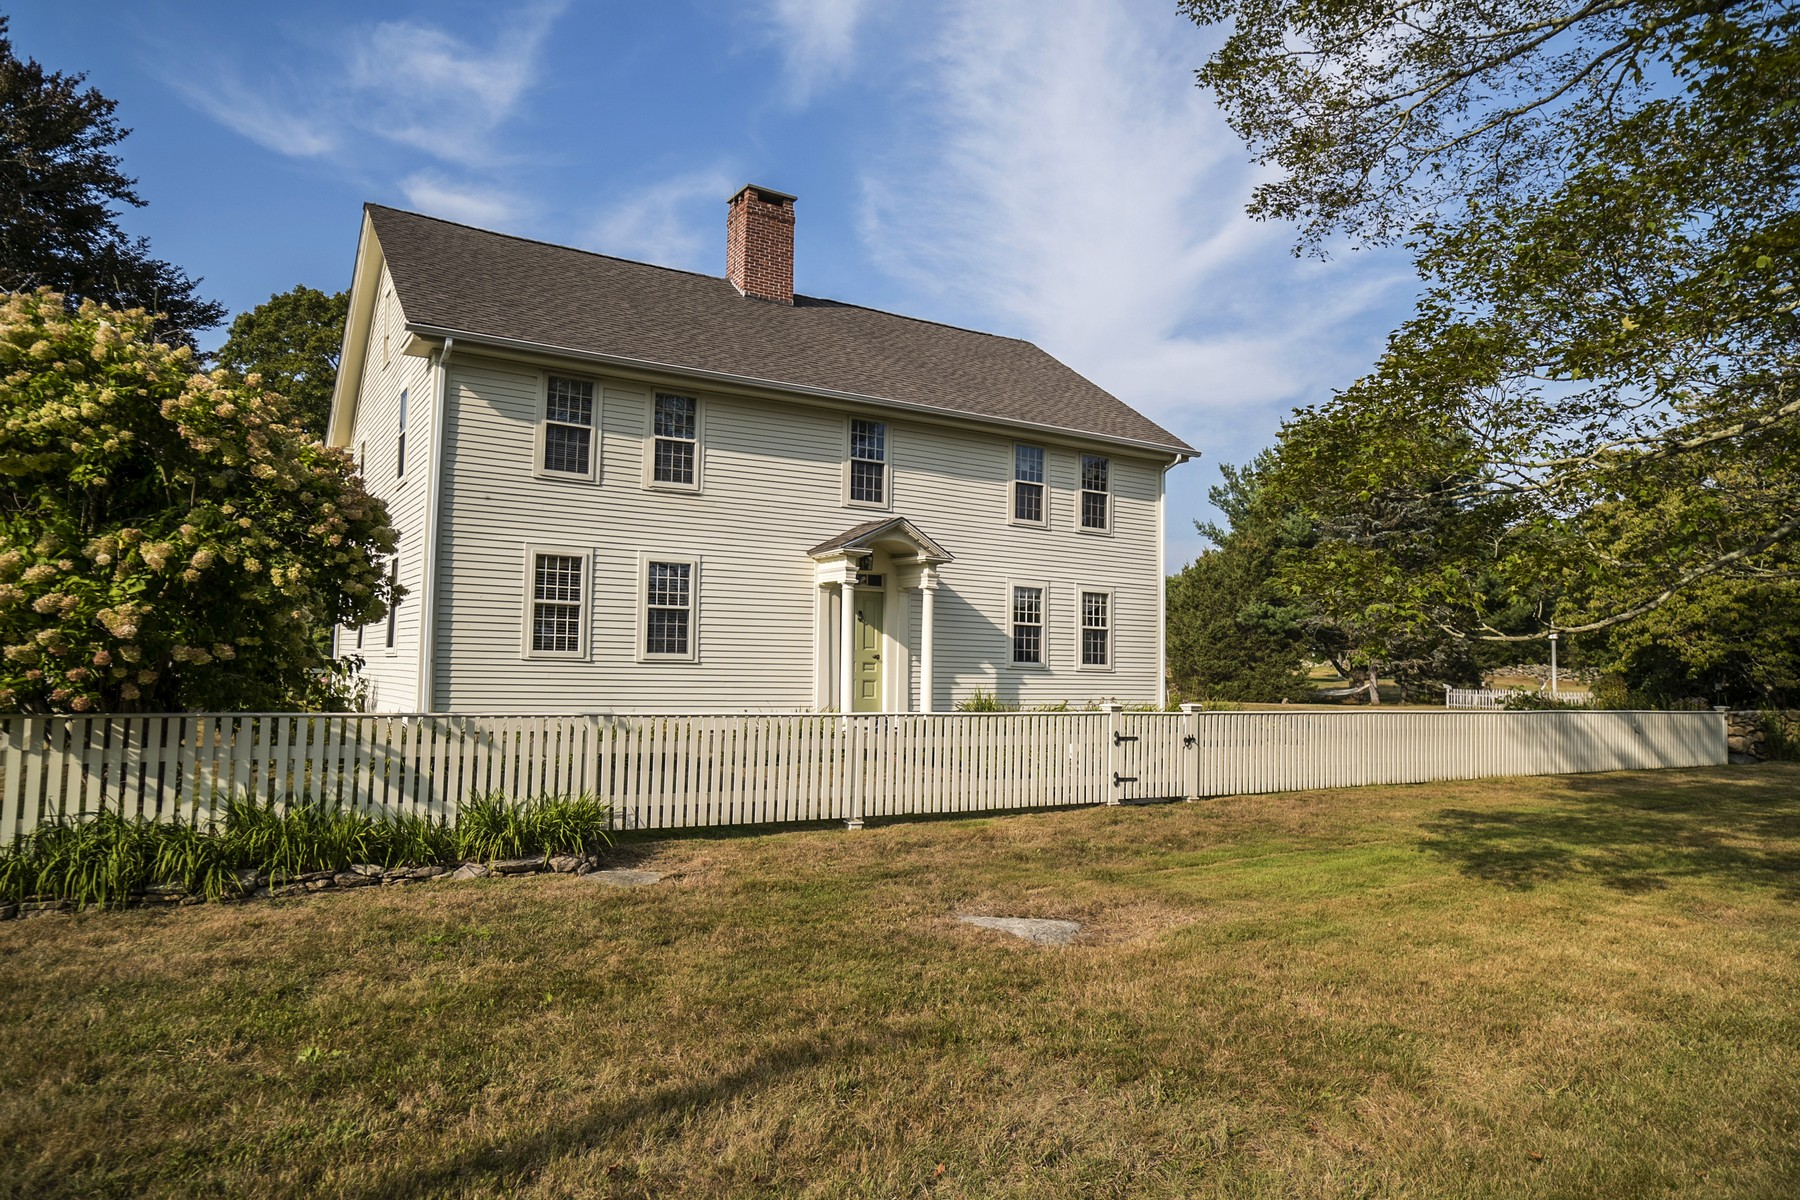 独户住宅 为 销售 在 Authentic Circa 1749 Historic Colonial 704 Al Harvey Road Stonington, 康涅狄格州 06378 美国